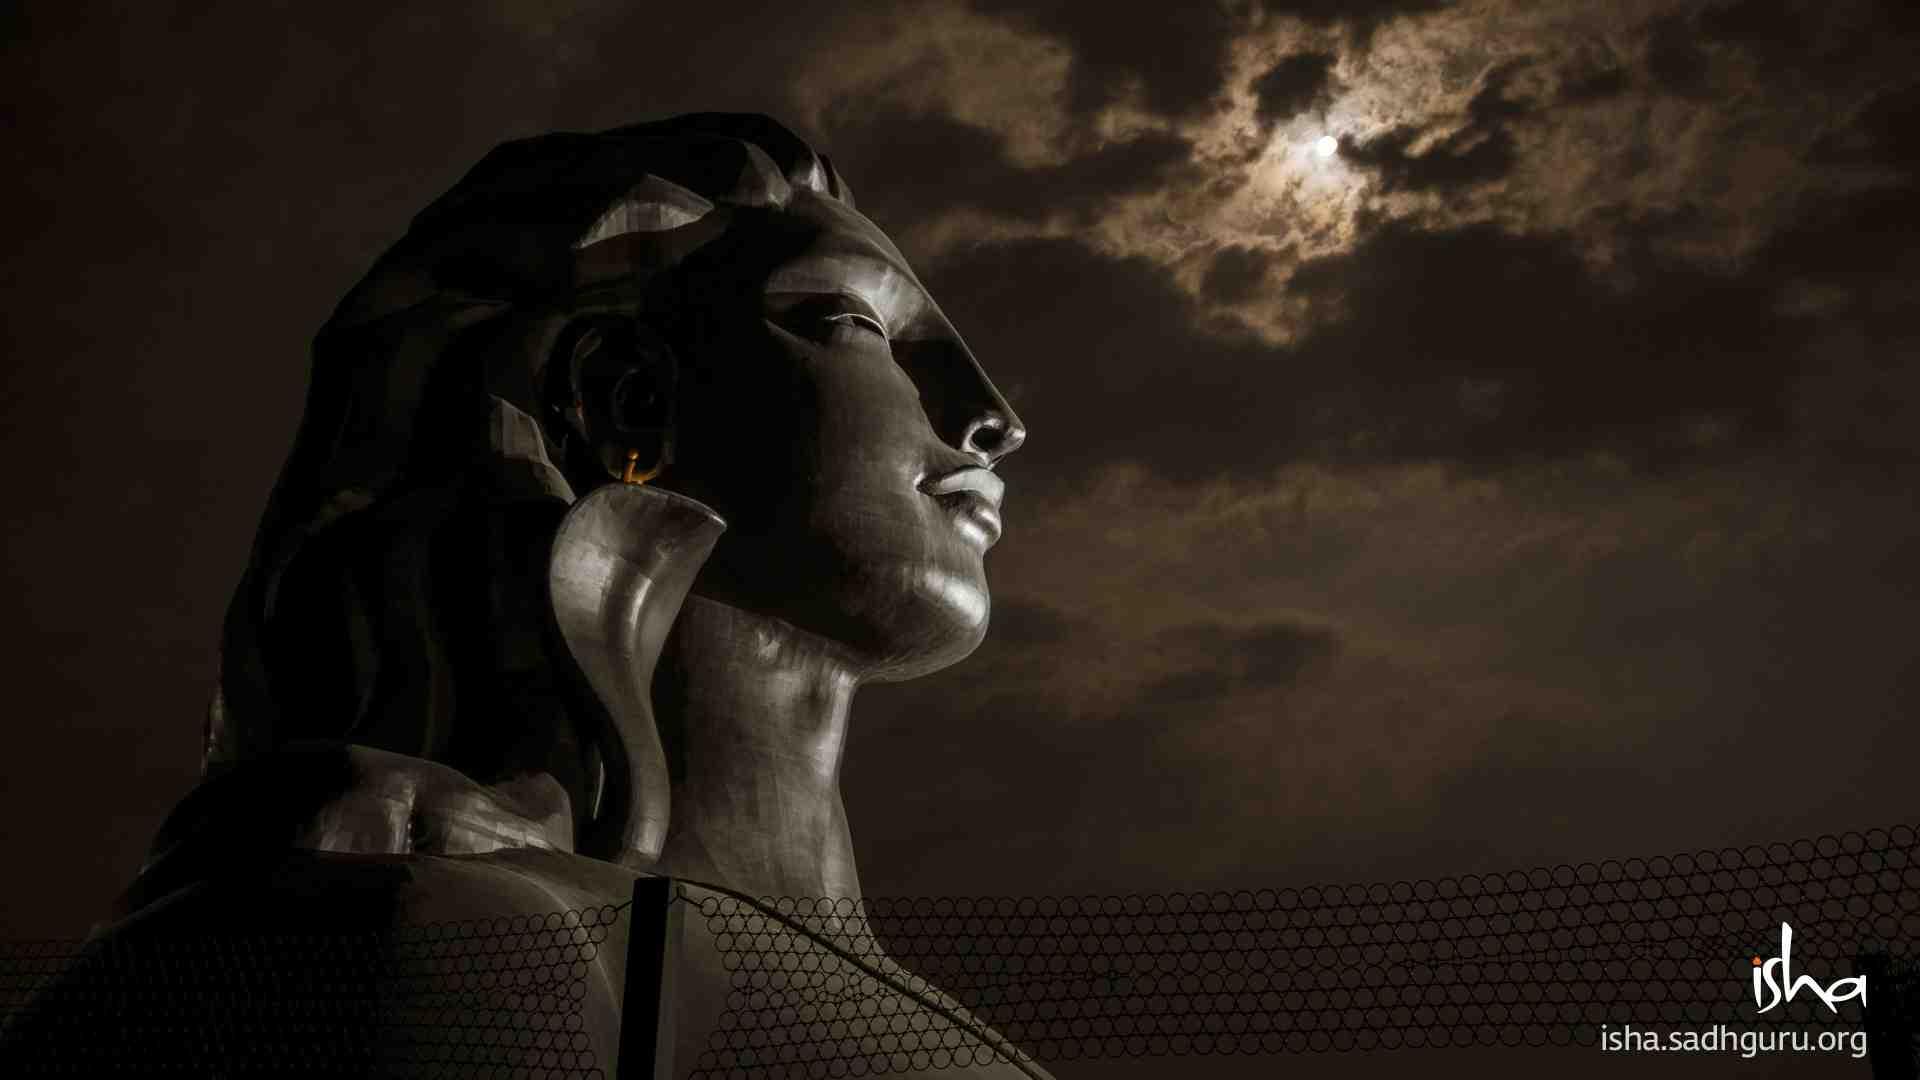 Shiva Wallpaper - on a Full moon ( Pournami ) night